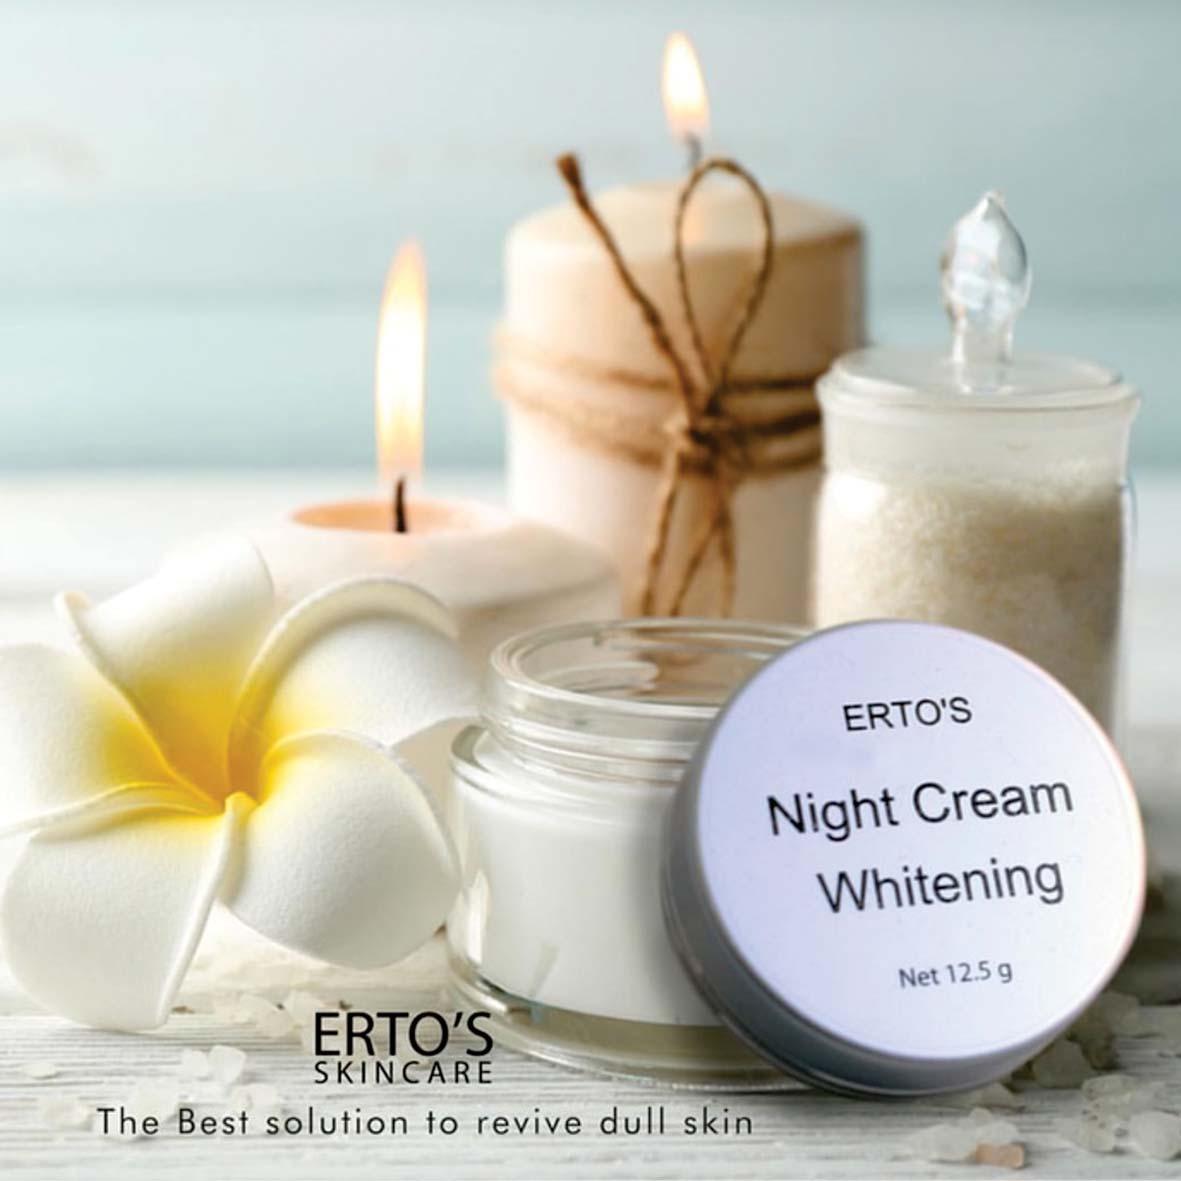 Buy Sell Cheapest Ertos Night Krim Best Quality Product Deals Dermo Care Whitening Cream Malam Menghilangkan Flek Hitam Dan Mengecilkan Pori Wajah Dll Original Aman Hallal Berbpom